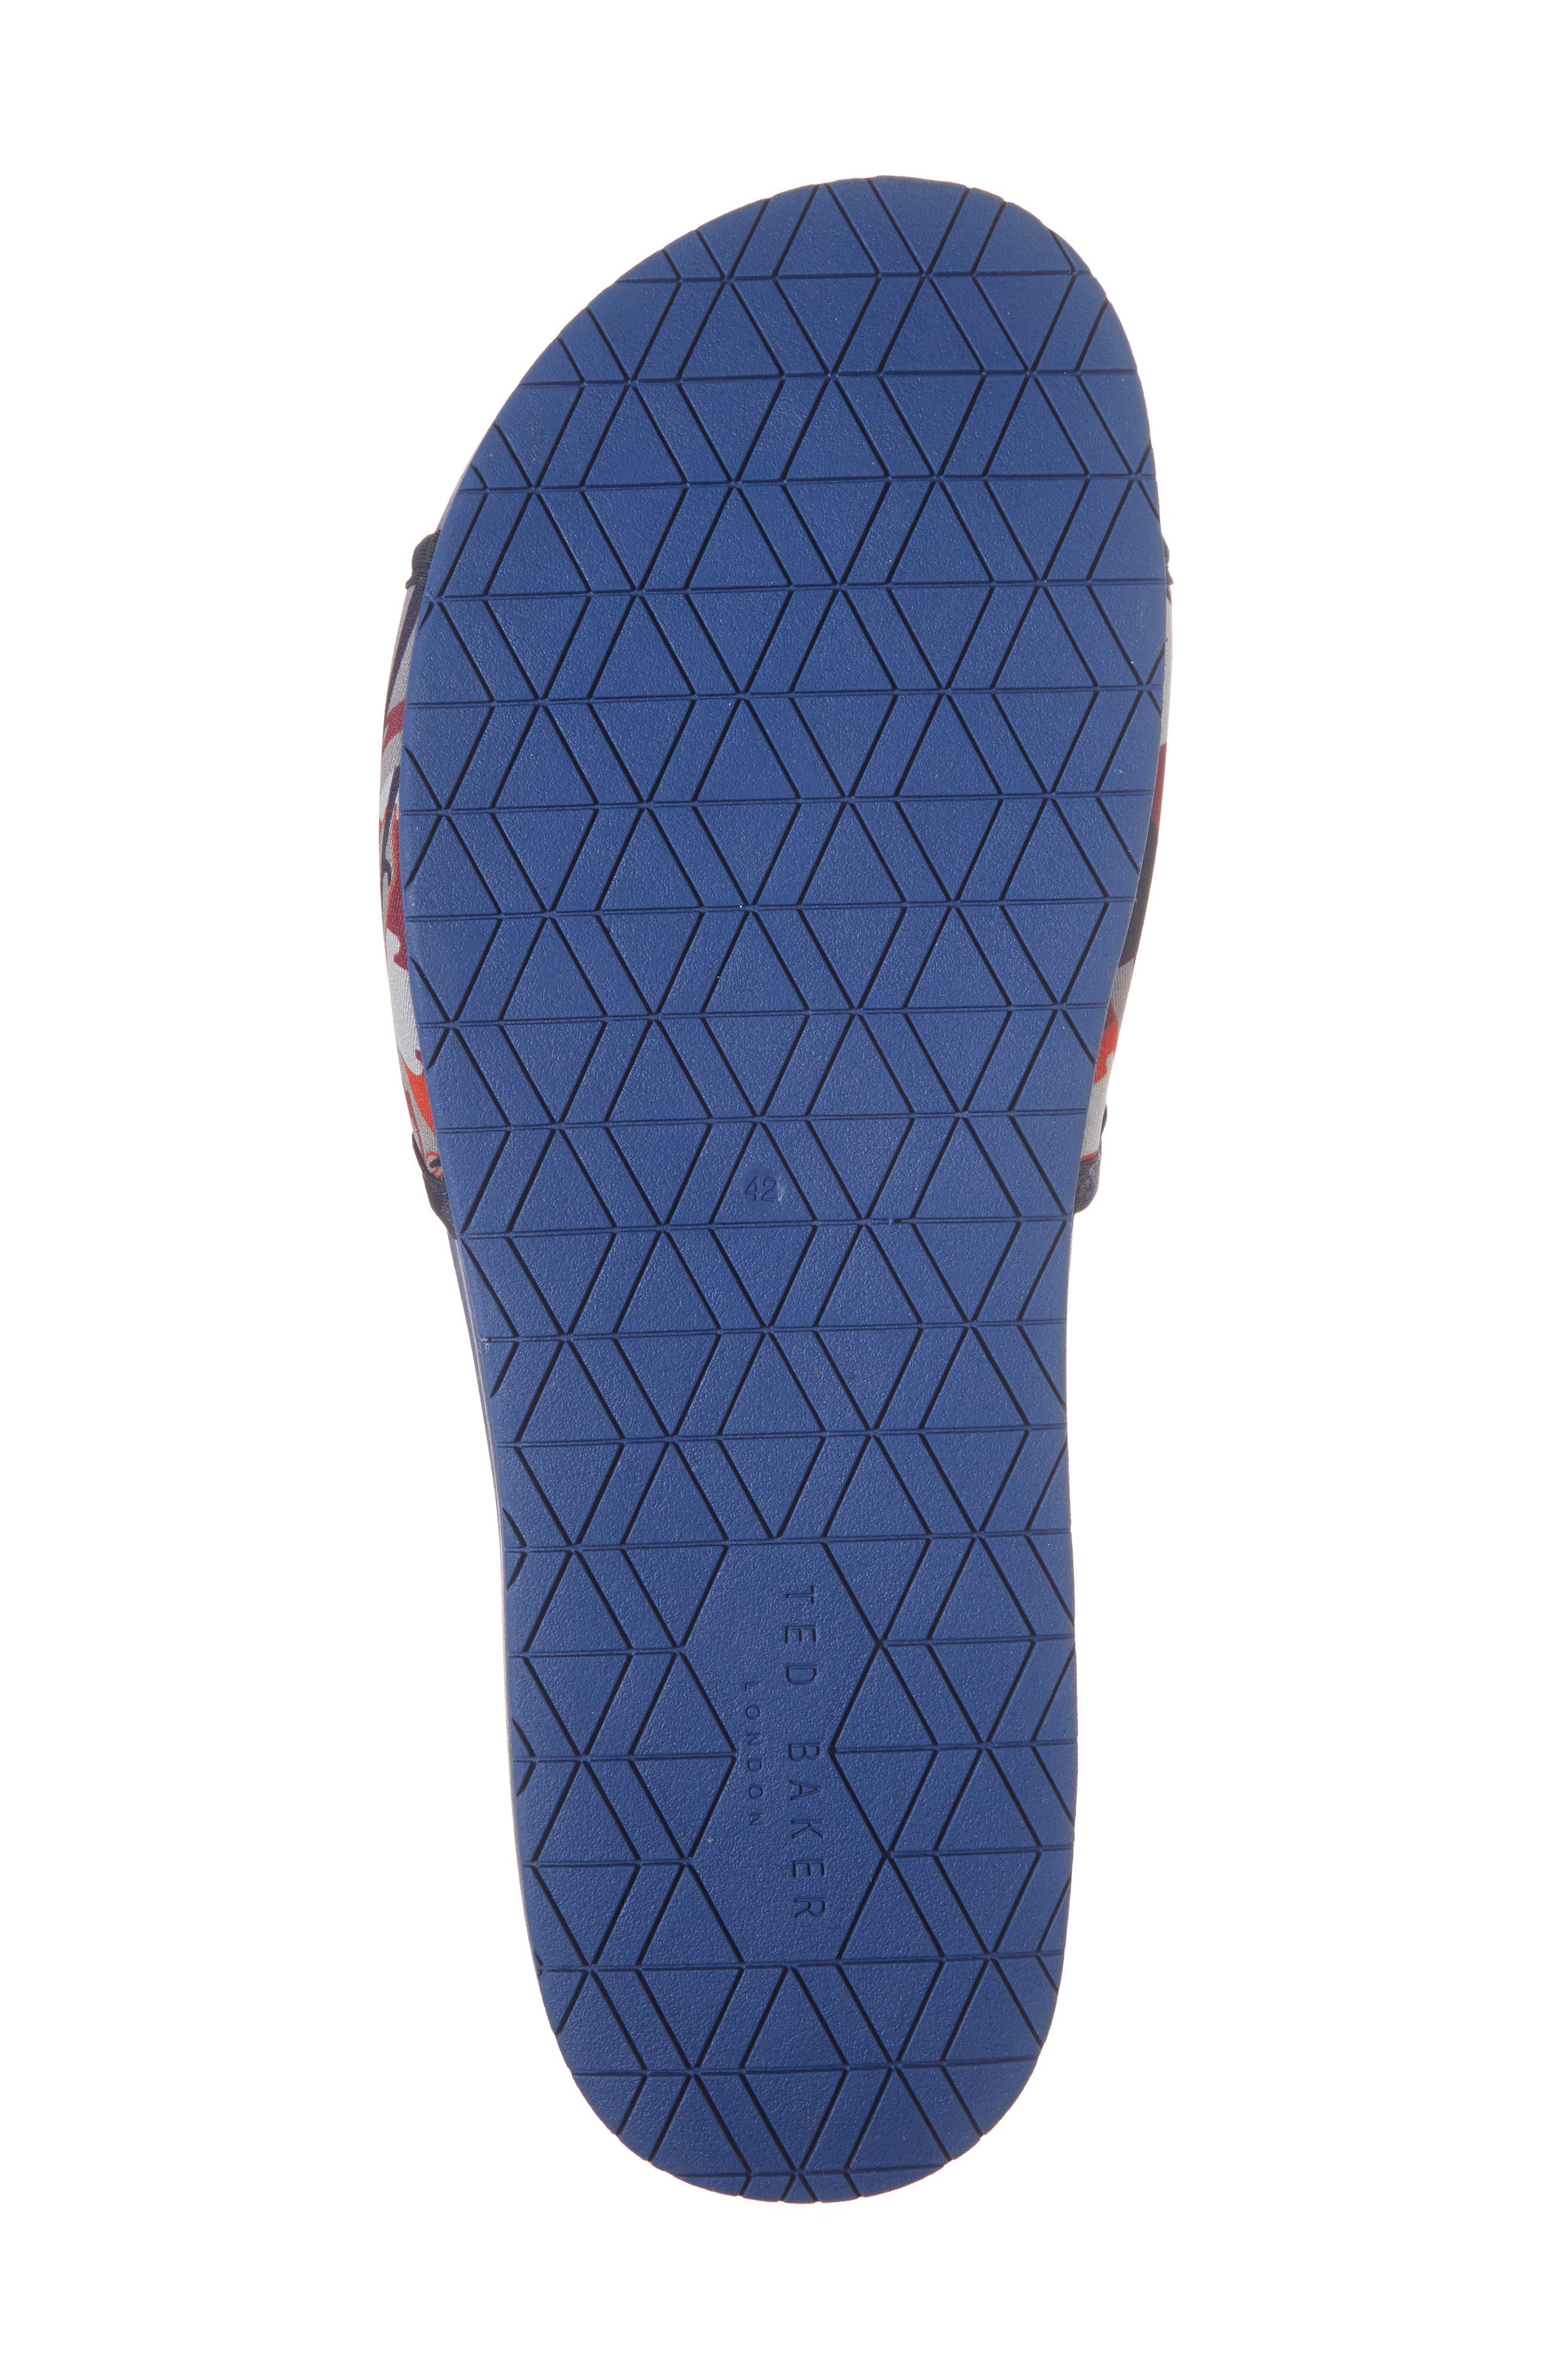 Sauldi 2 Slide Sandal,                             Alternate thumbnail 6, color,                             Dark Blue